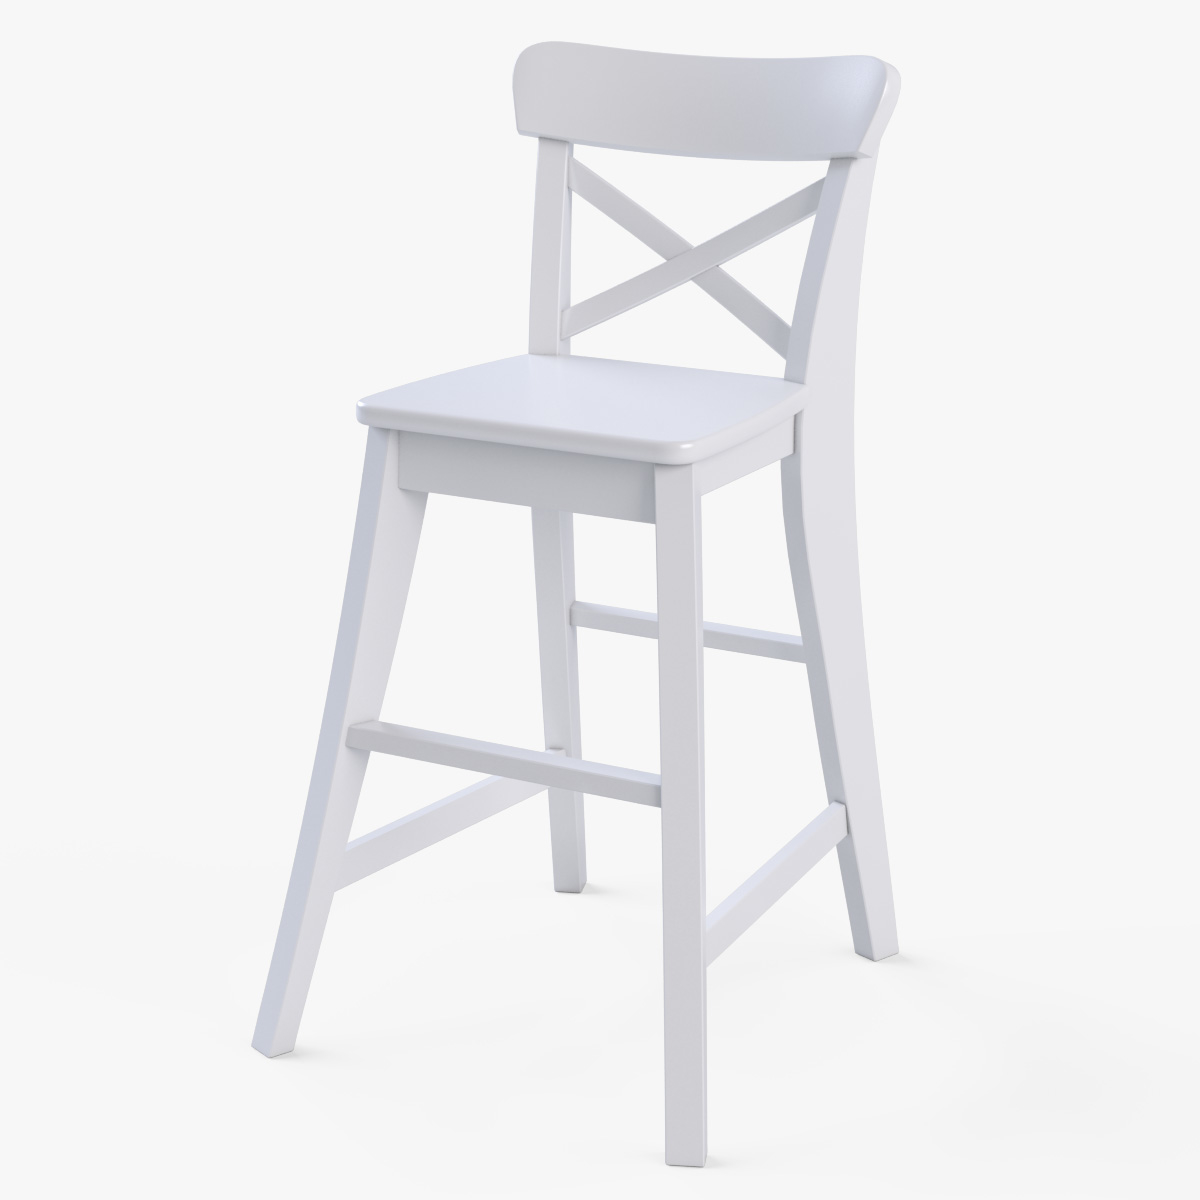 Phenomenal Junior Chair Ikea Ingolf White Andrewgaddart Wooden Chair Designs For Living Room Andrewgaddartcom